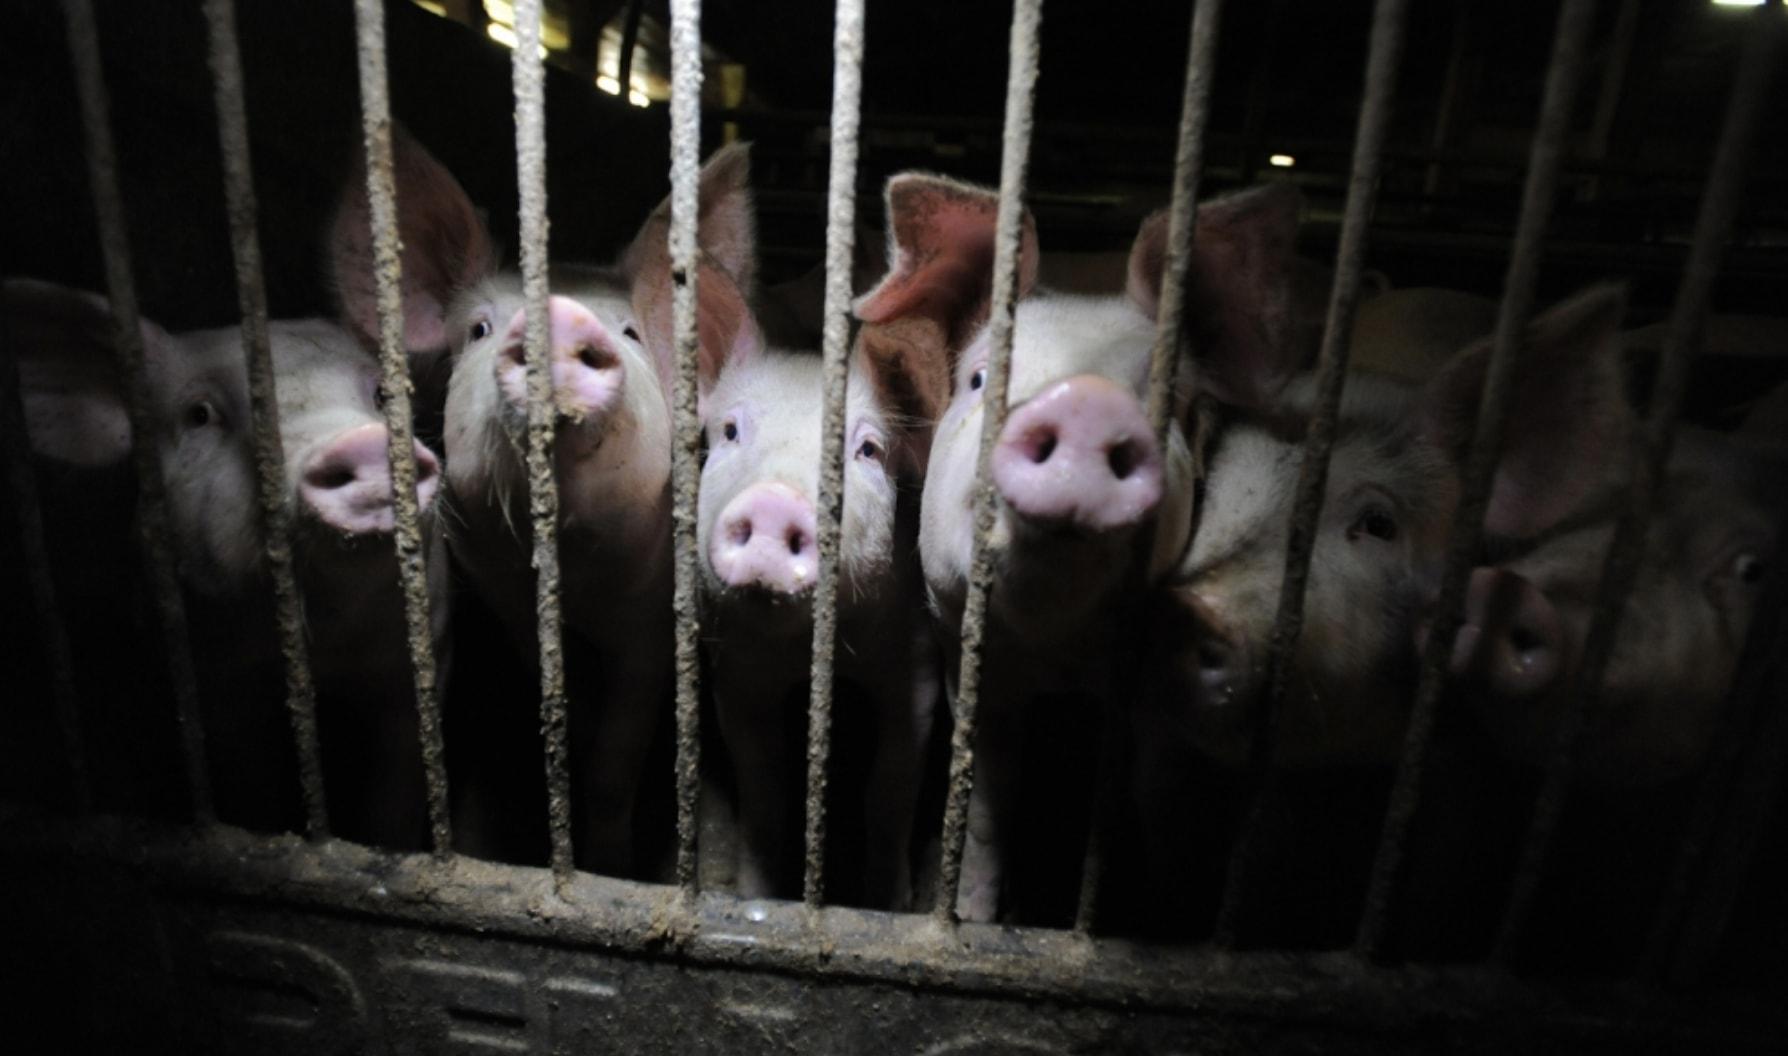 vegan-plantbased-pigs-factoryfarm.jpg